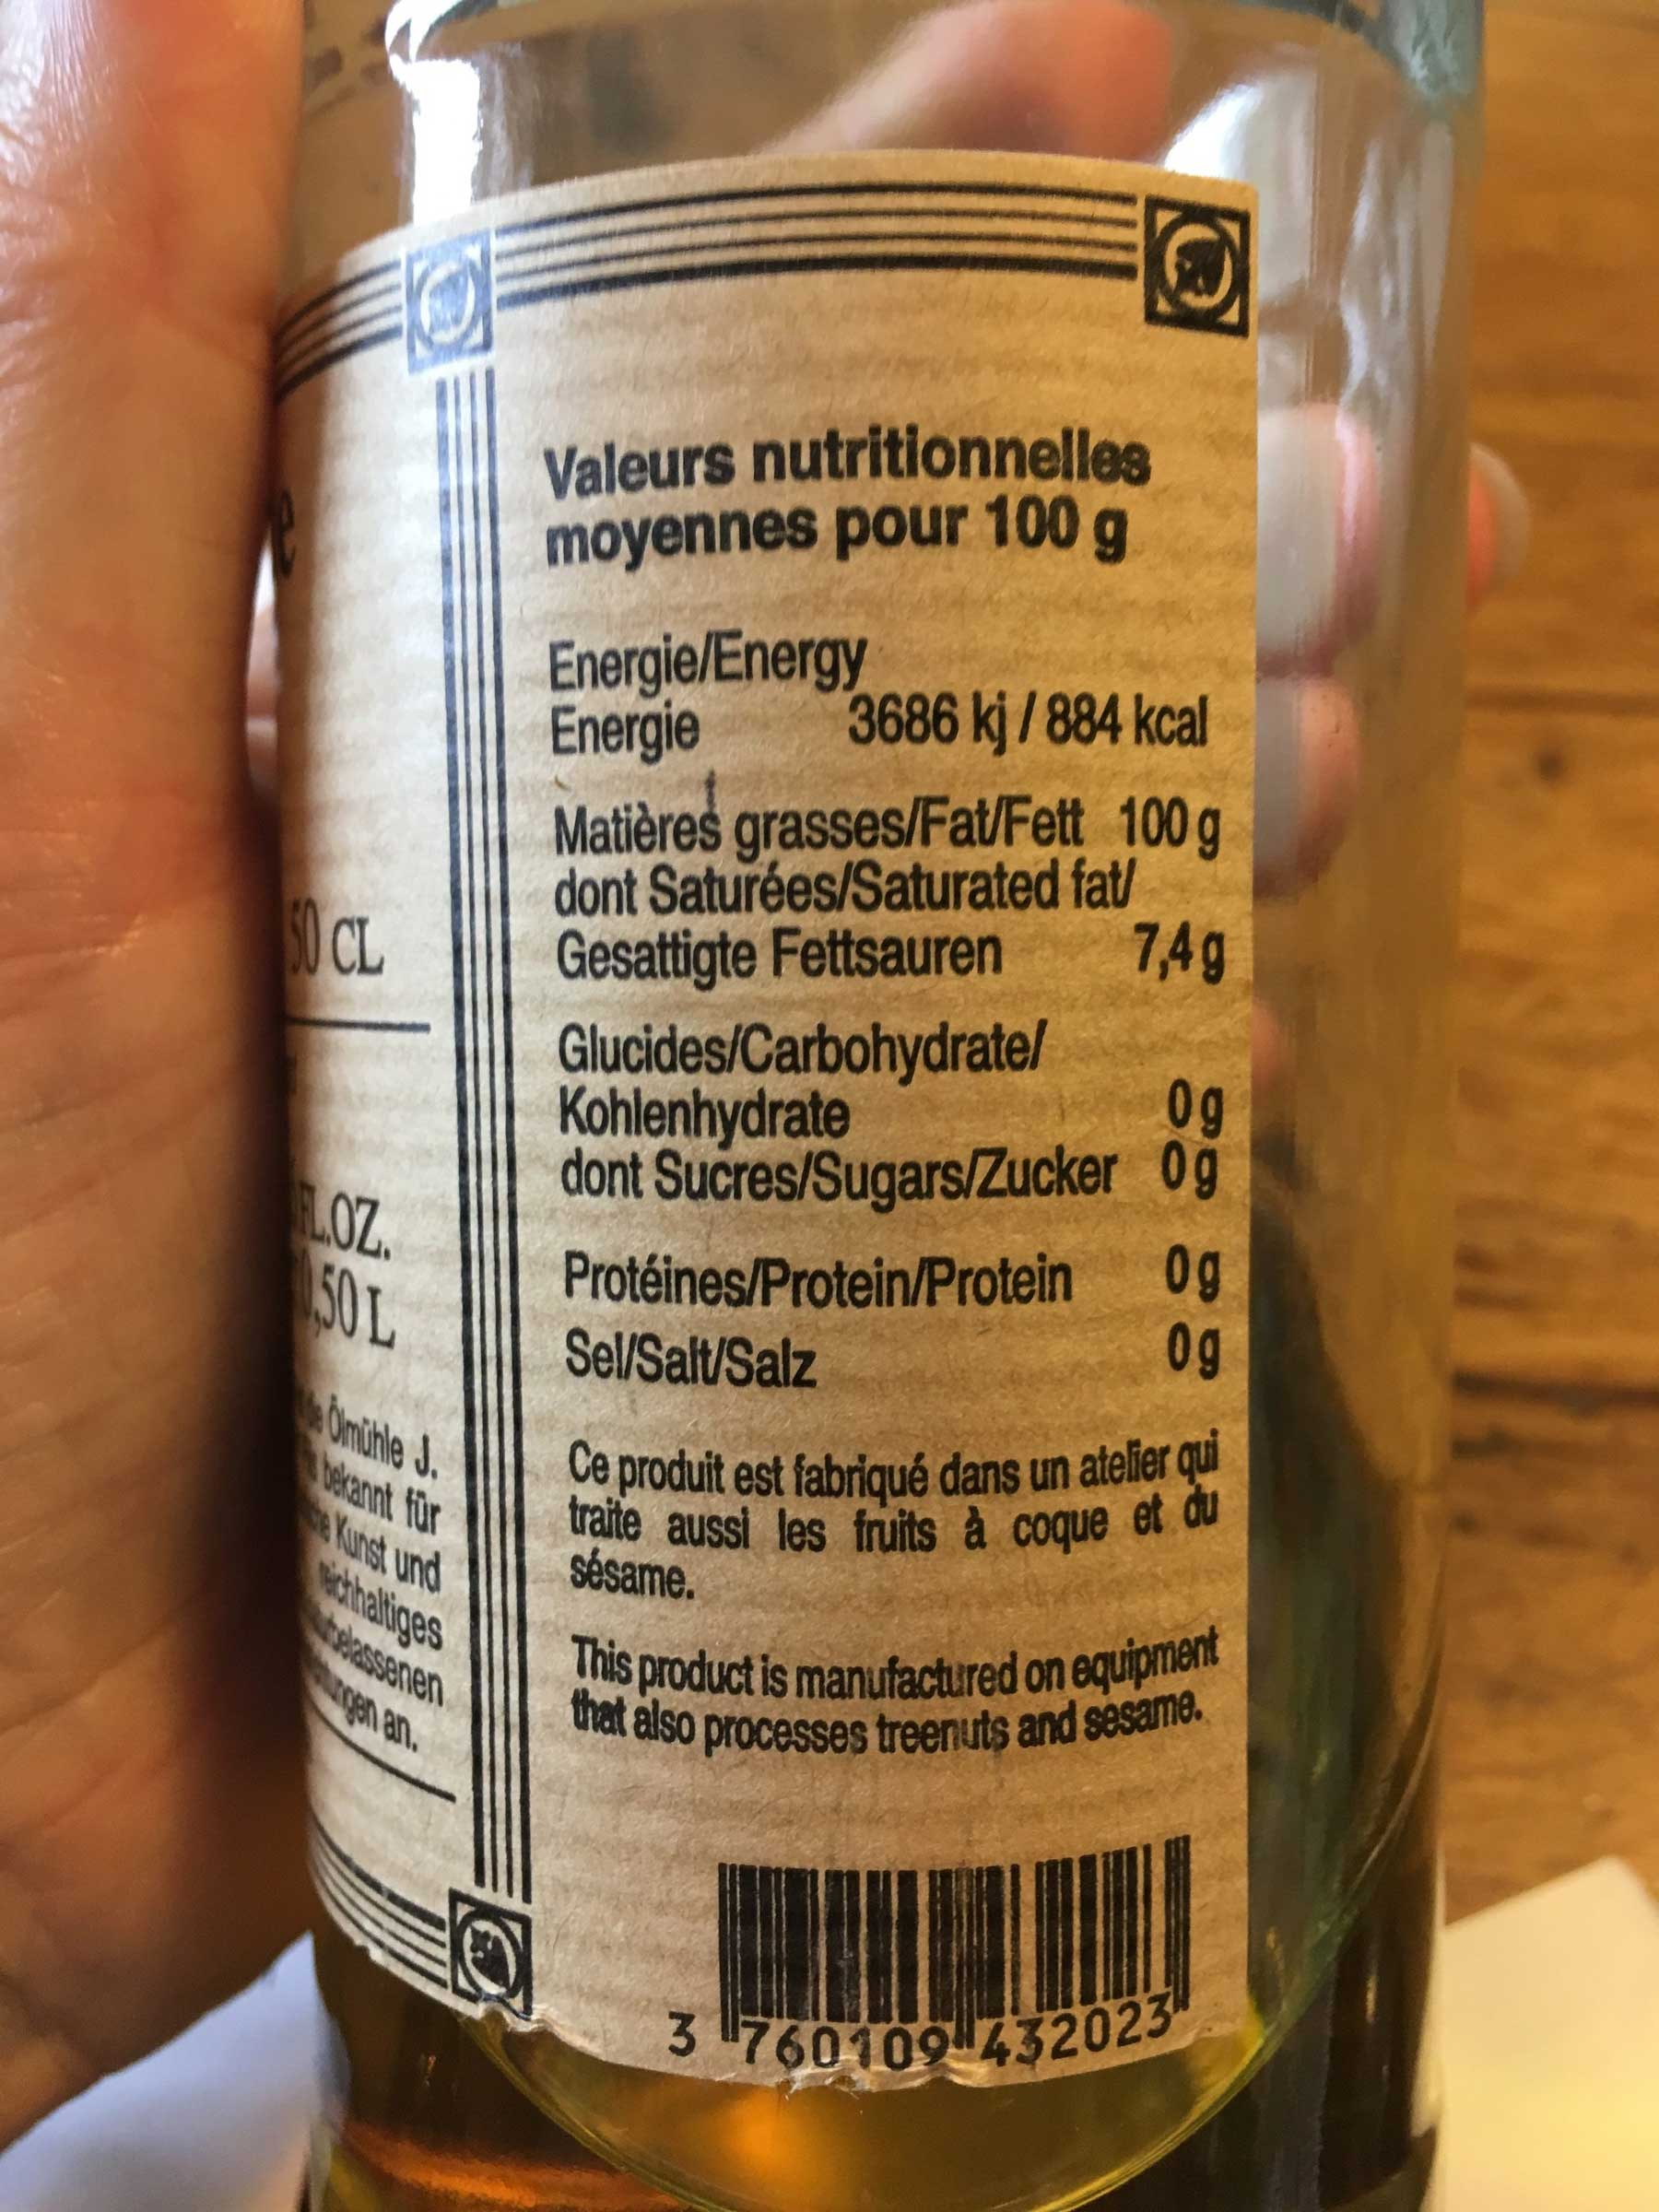 rench olive oil, J. Leblanc brand. Nutrition label